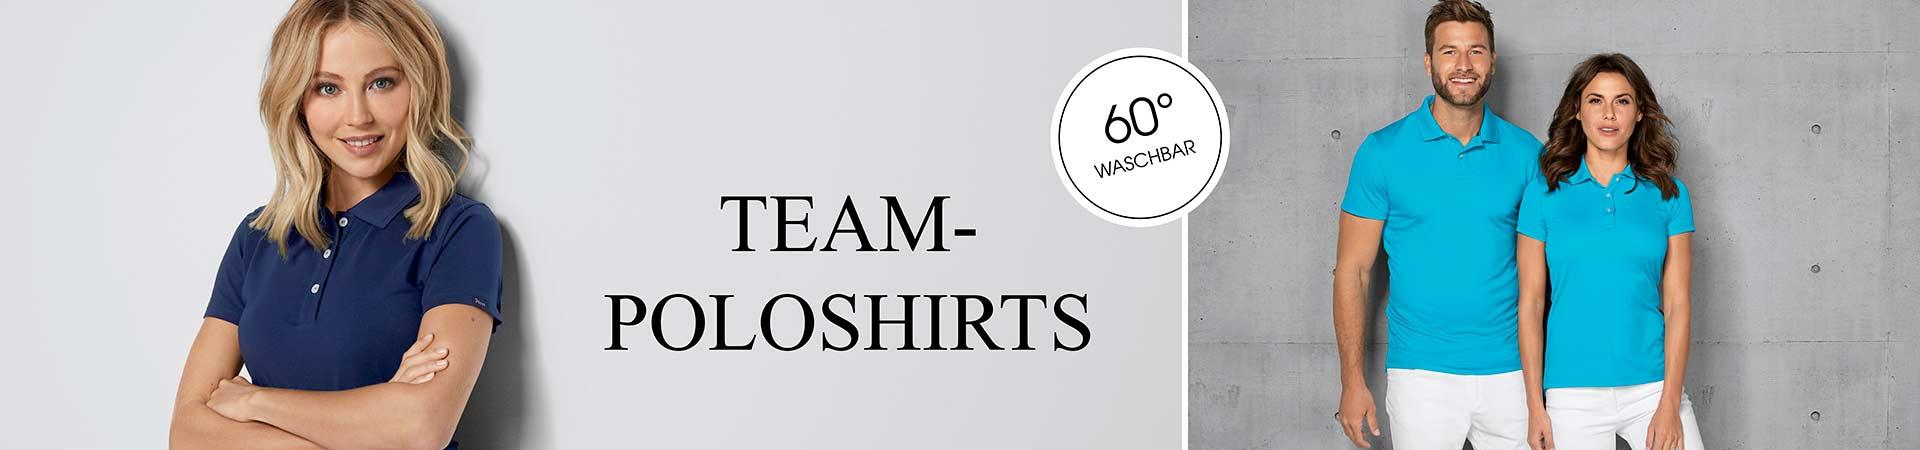 Berufsbekleidung - Poloshirts